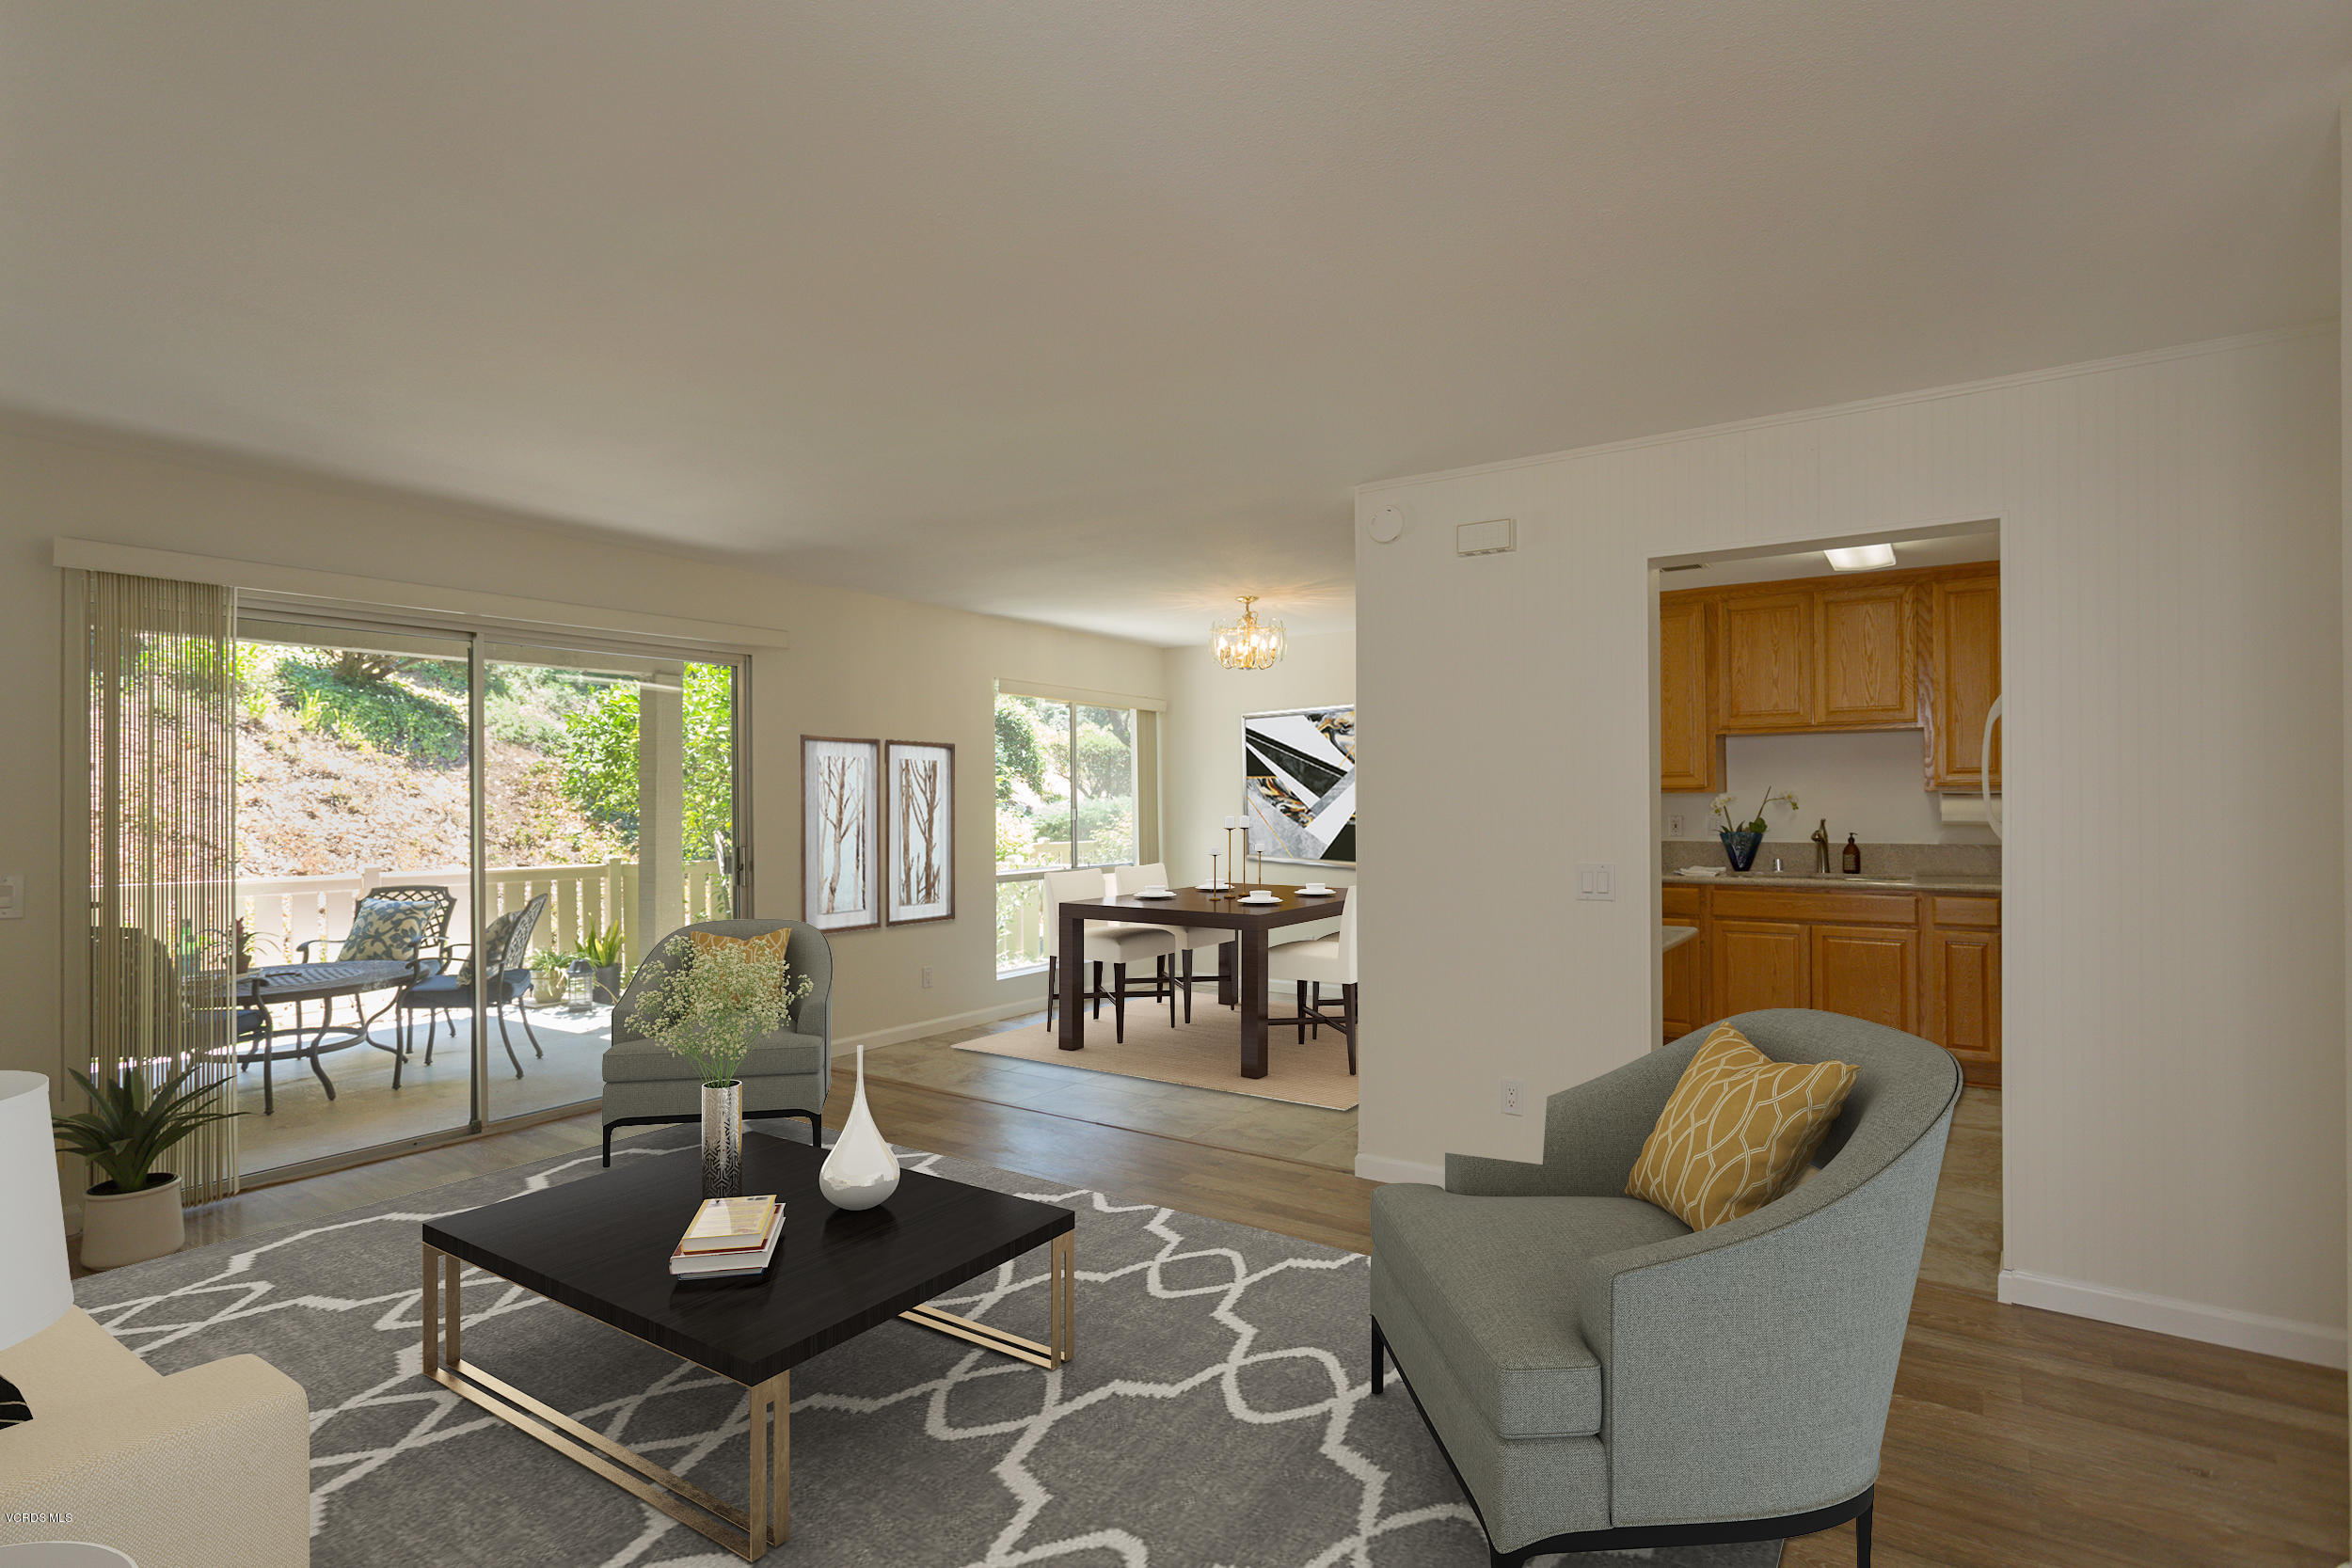 254 Sequoia Court, Thousand Oaks, CA 91360